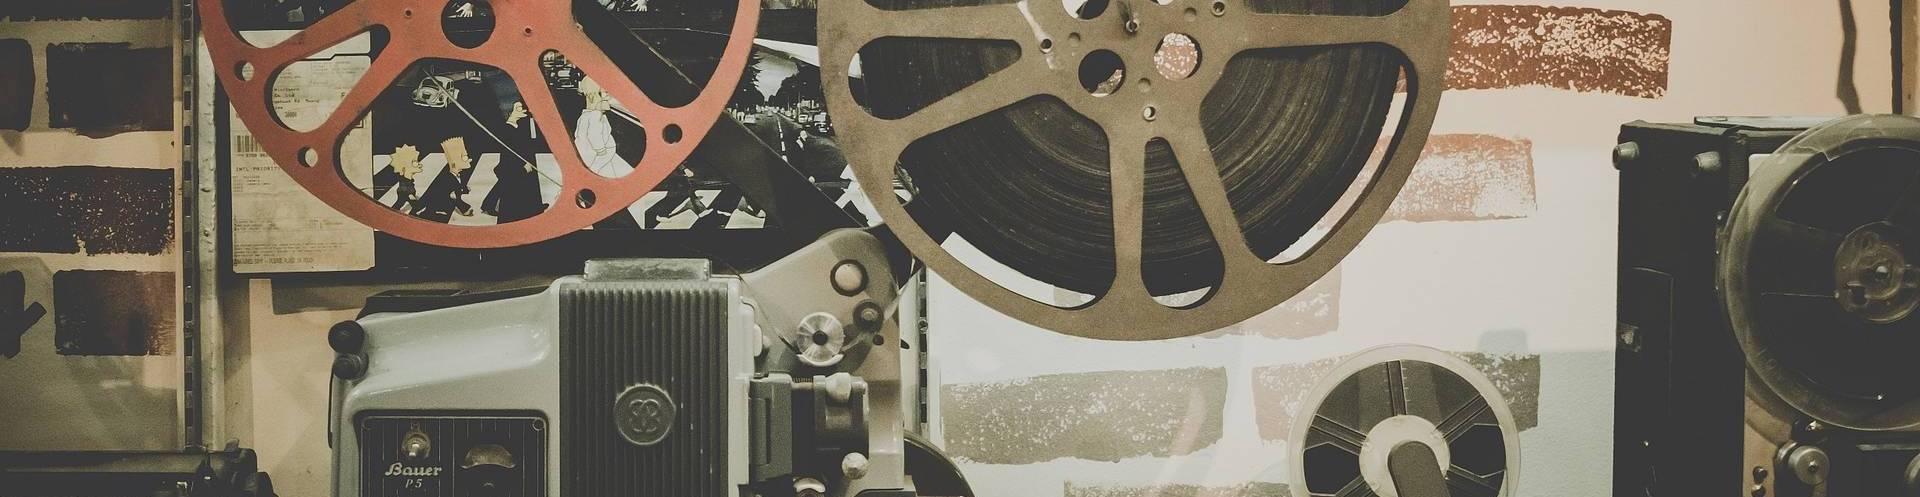 Fifth Latin American Film Festival